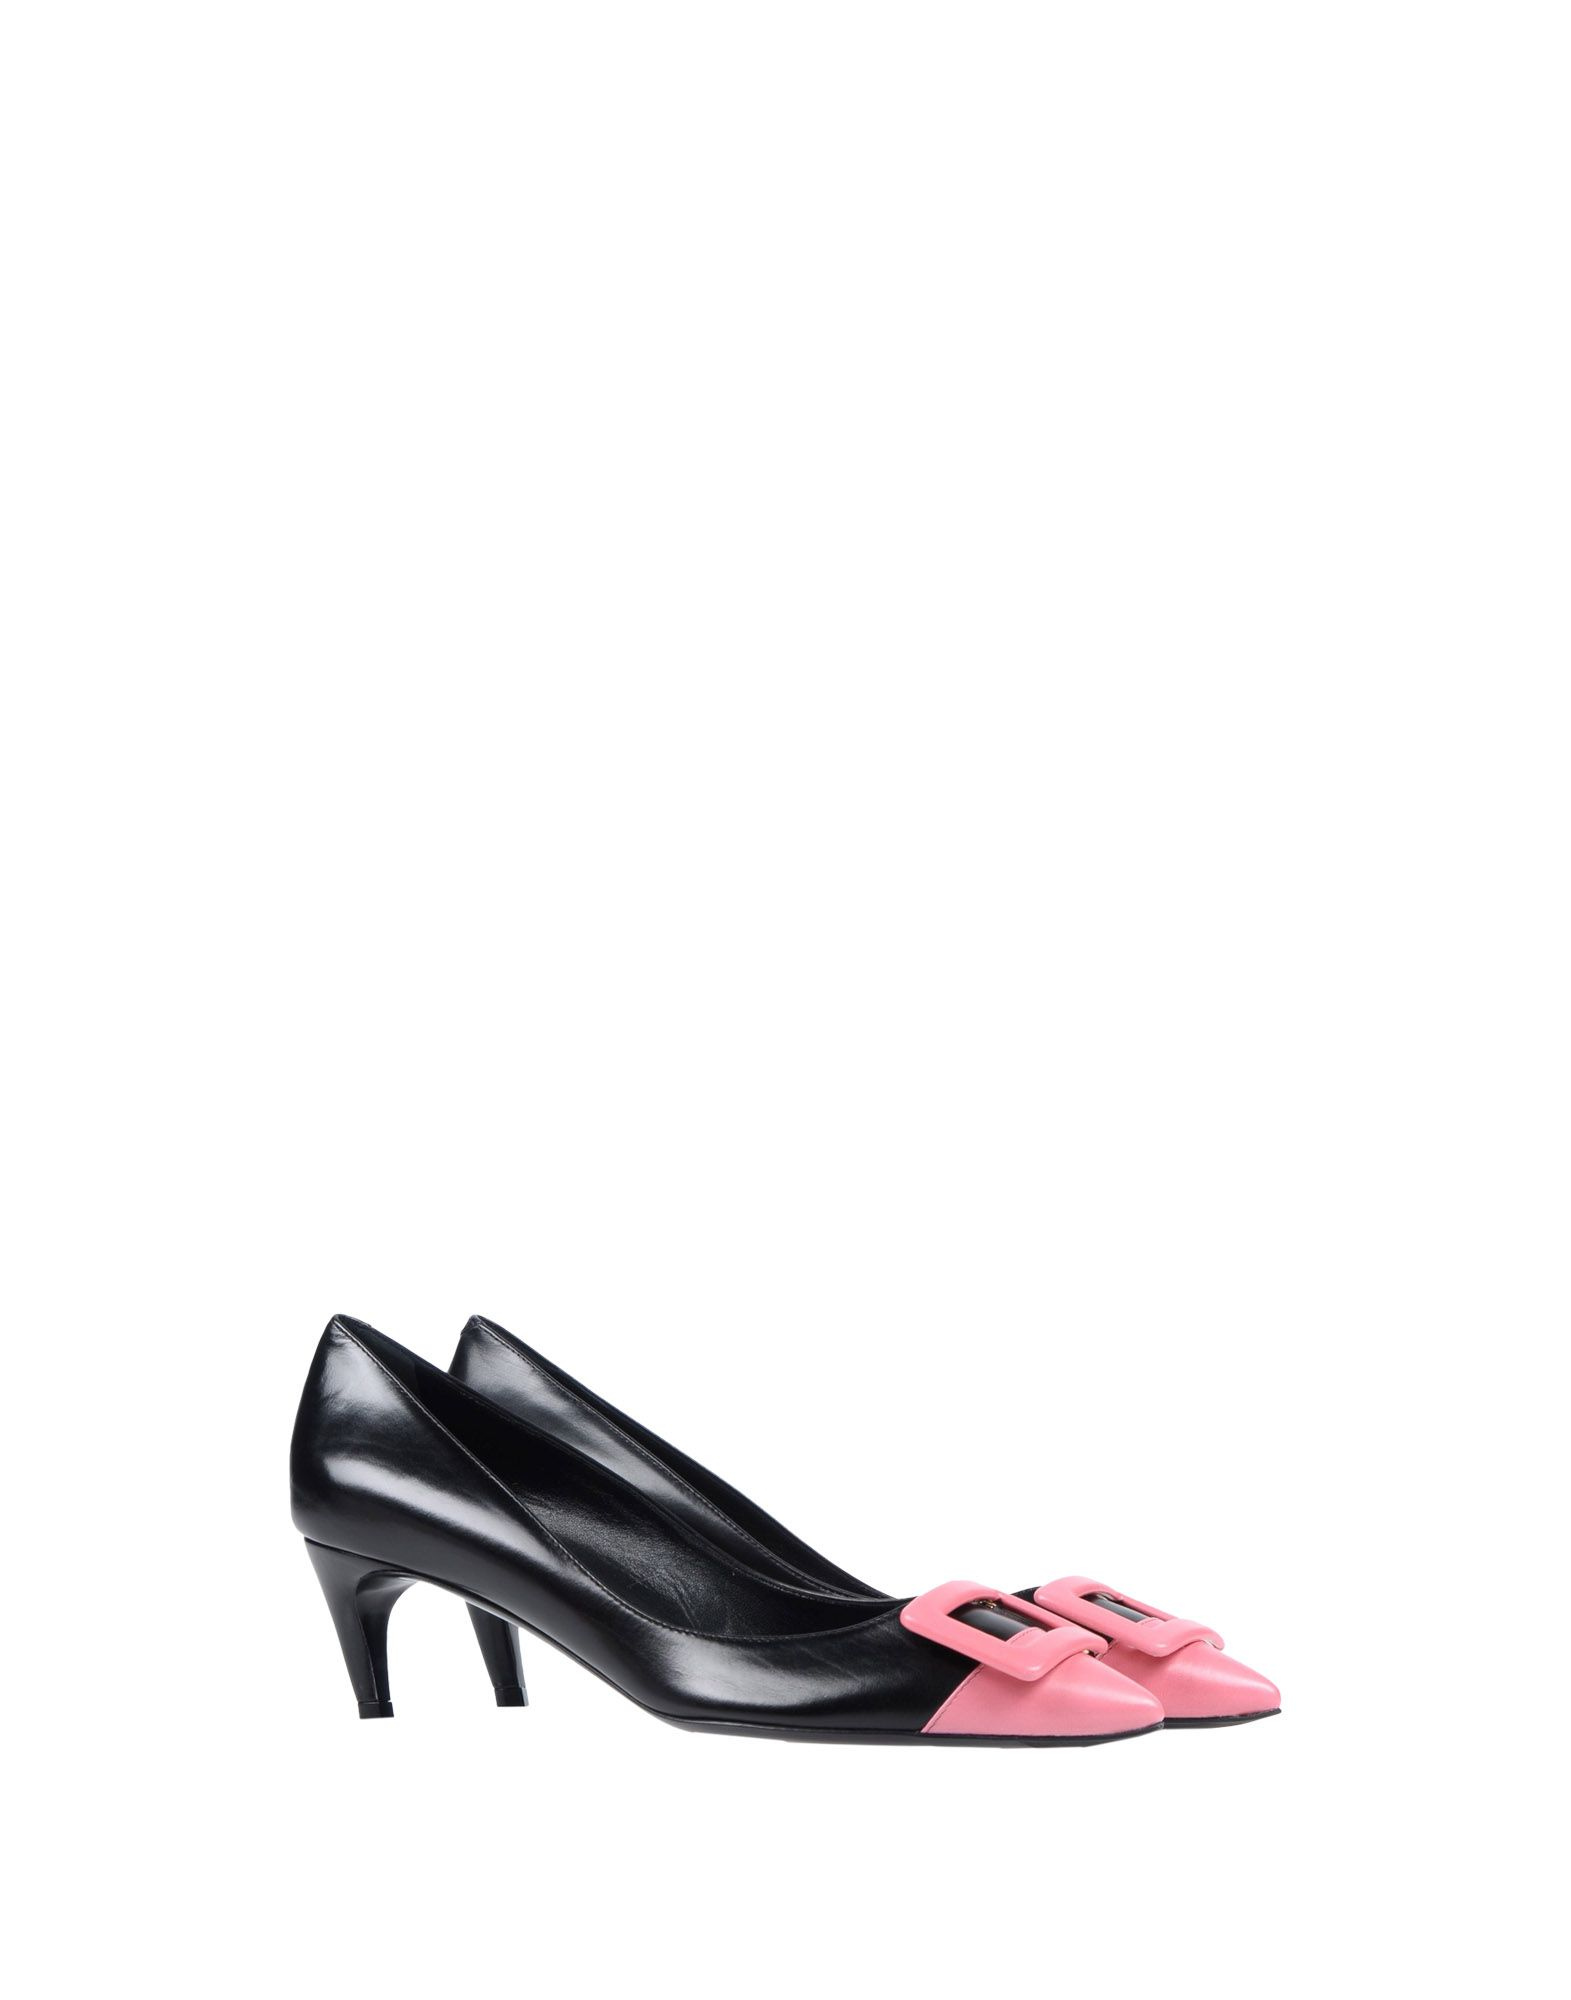 Roger 11504111QLGünstige Vivier Pumps Damen  11504111QLGünstige Roger gut aussehende Schuhe cb2a87